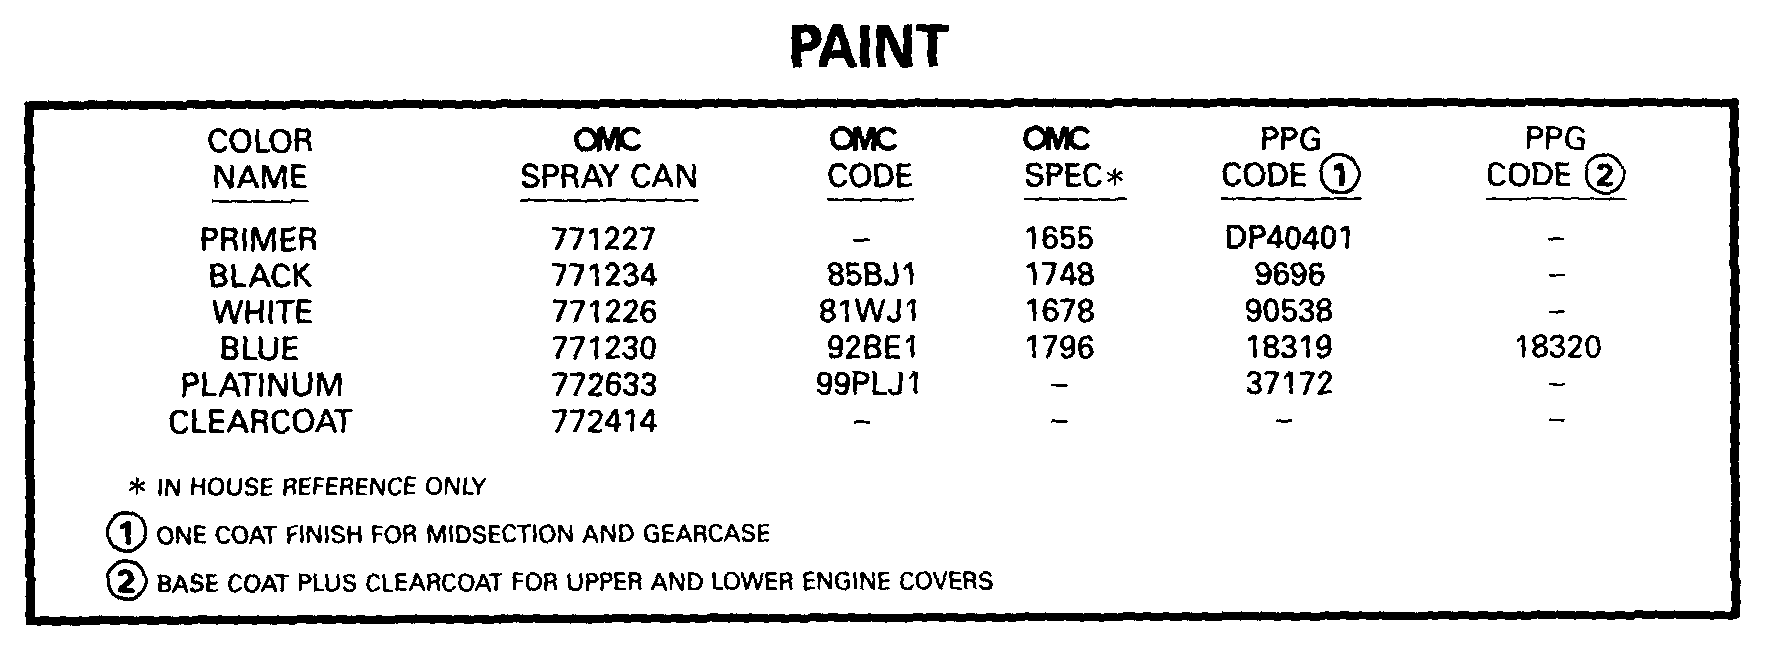 Evinrude Paint Colours Color Ideas Need The Wiring Diagram For A 1970 40073a Ser E0236 Brp Johnson En 1999 8 J8reem